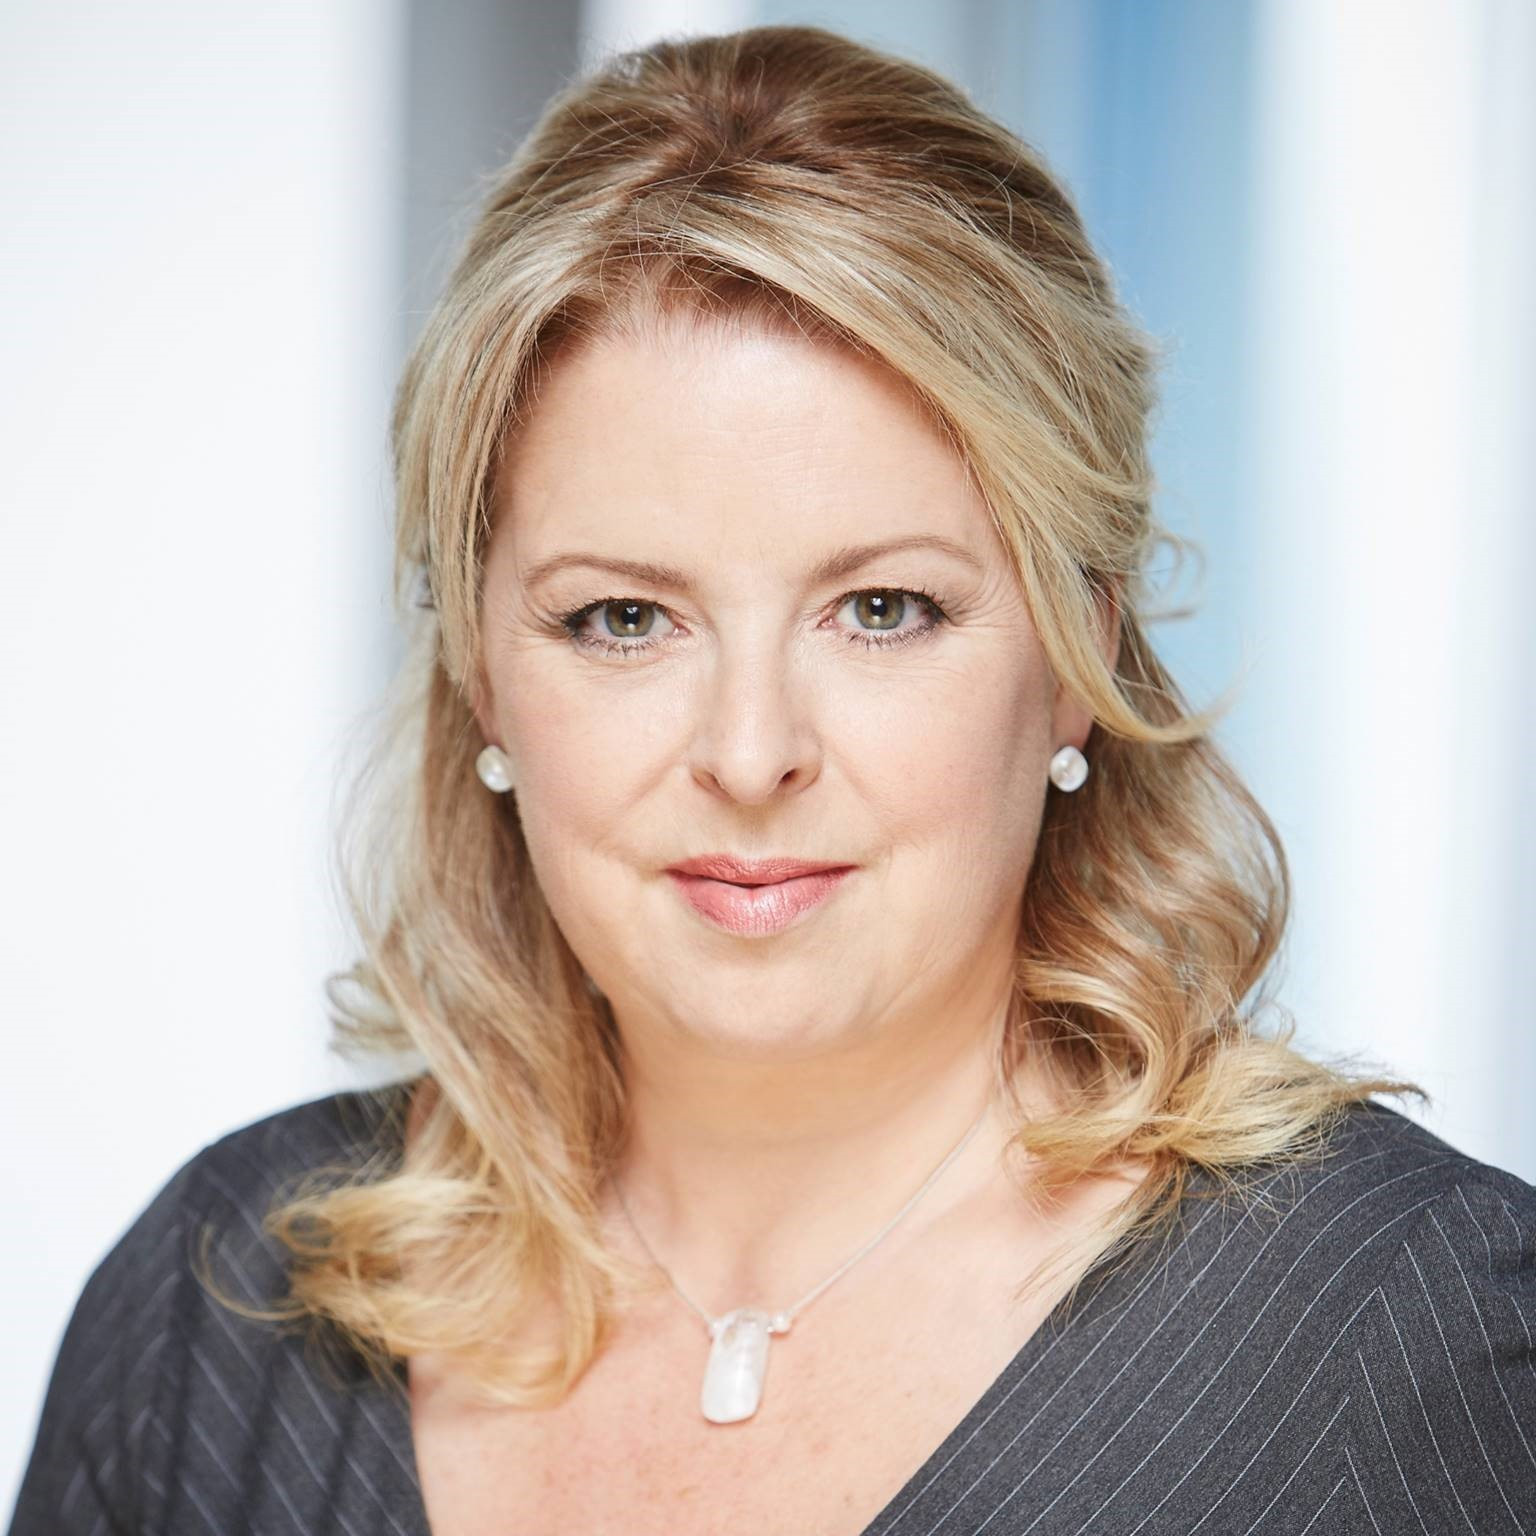 Anie Perrault